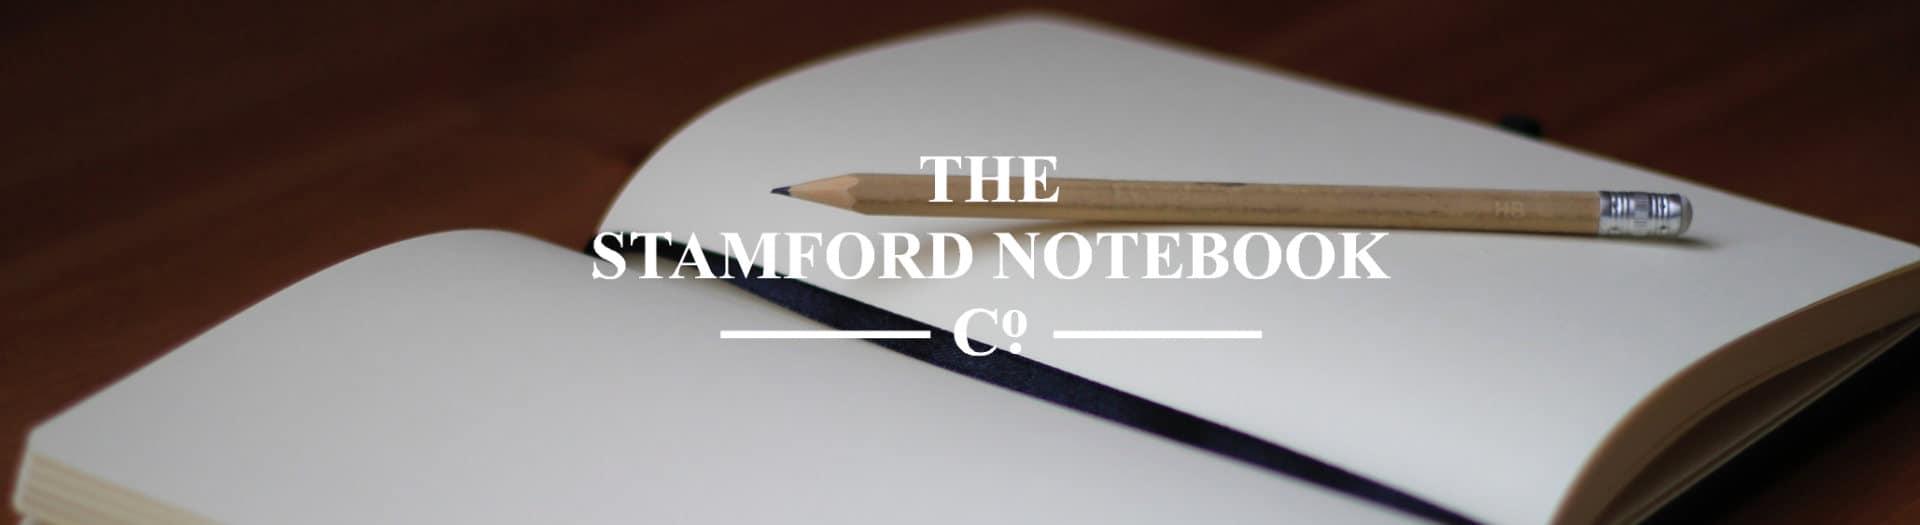 1920x525 stamford notebook header with logo